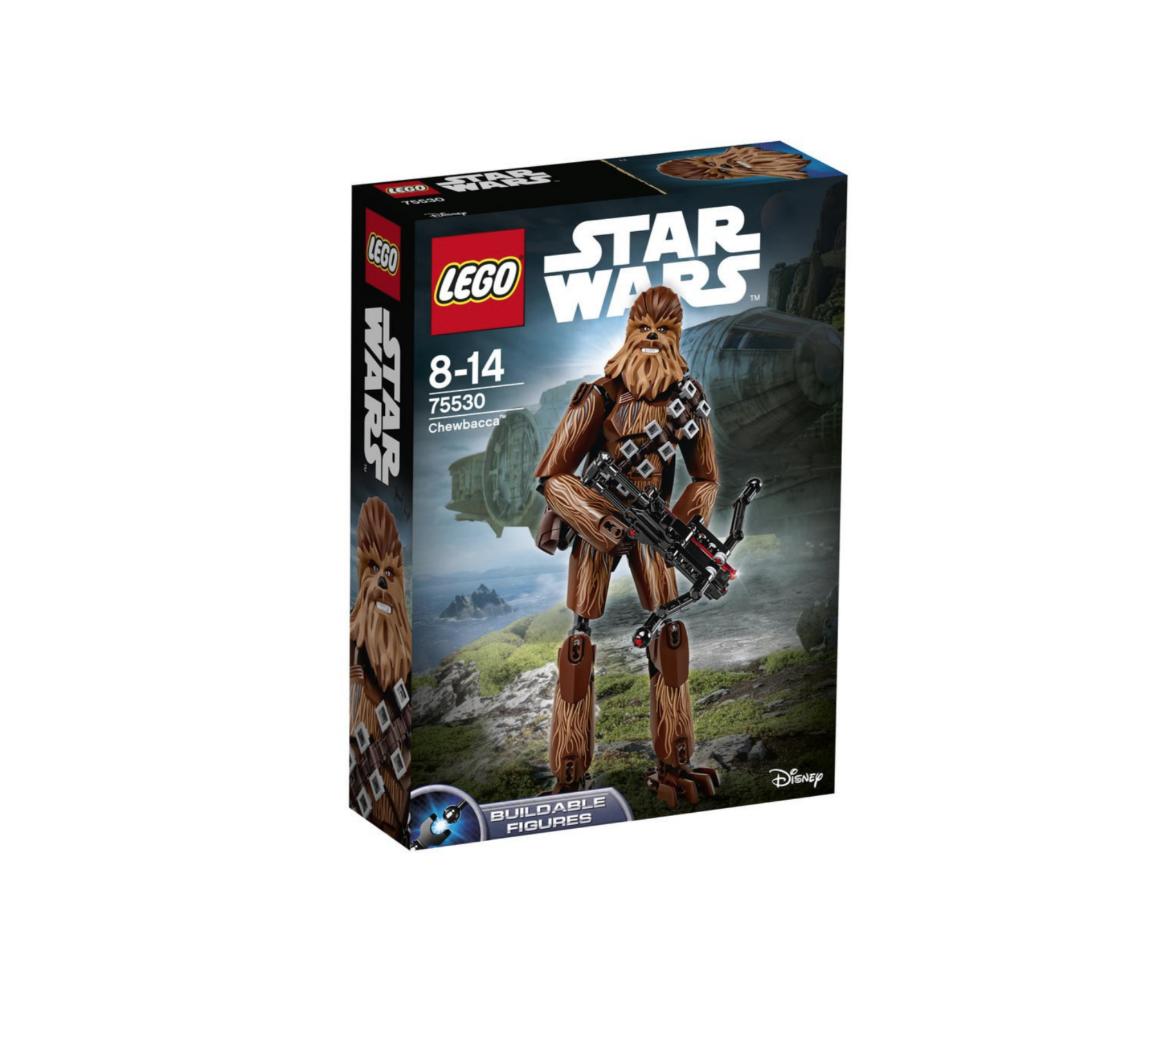 LEGO STAR WARS  CHEWBACCA  ( CHUBACCA , CHUBAKA ) JOUET JEU JEUX CONSTRUCTION ENFANT NOEL NEUF 5702015868228 COMASOUND KARTEL 75530 ITEM 6175308